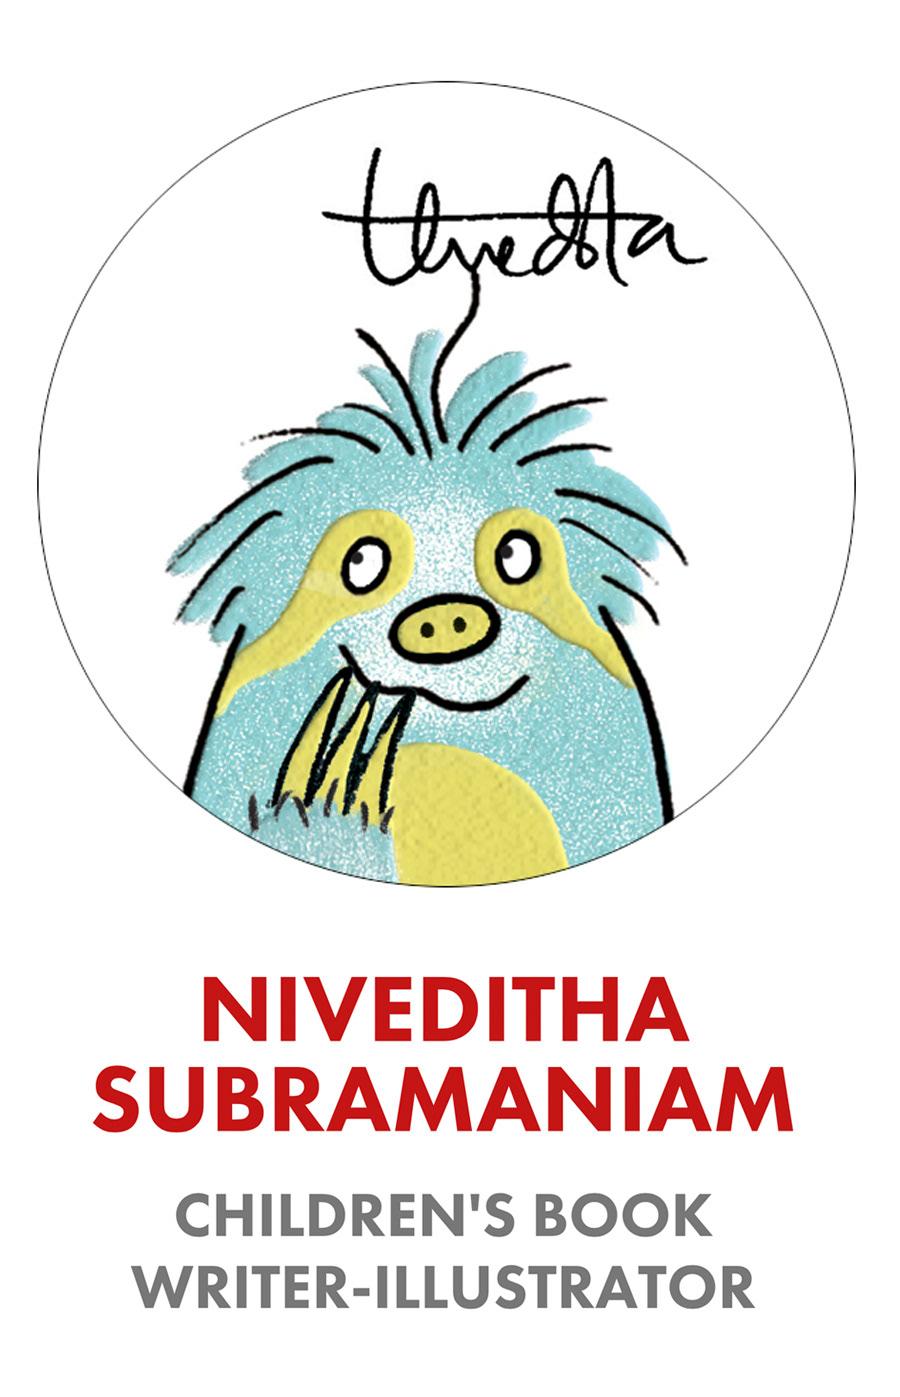 Niveditha Subramaniam